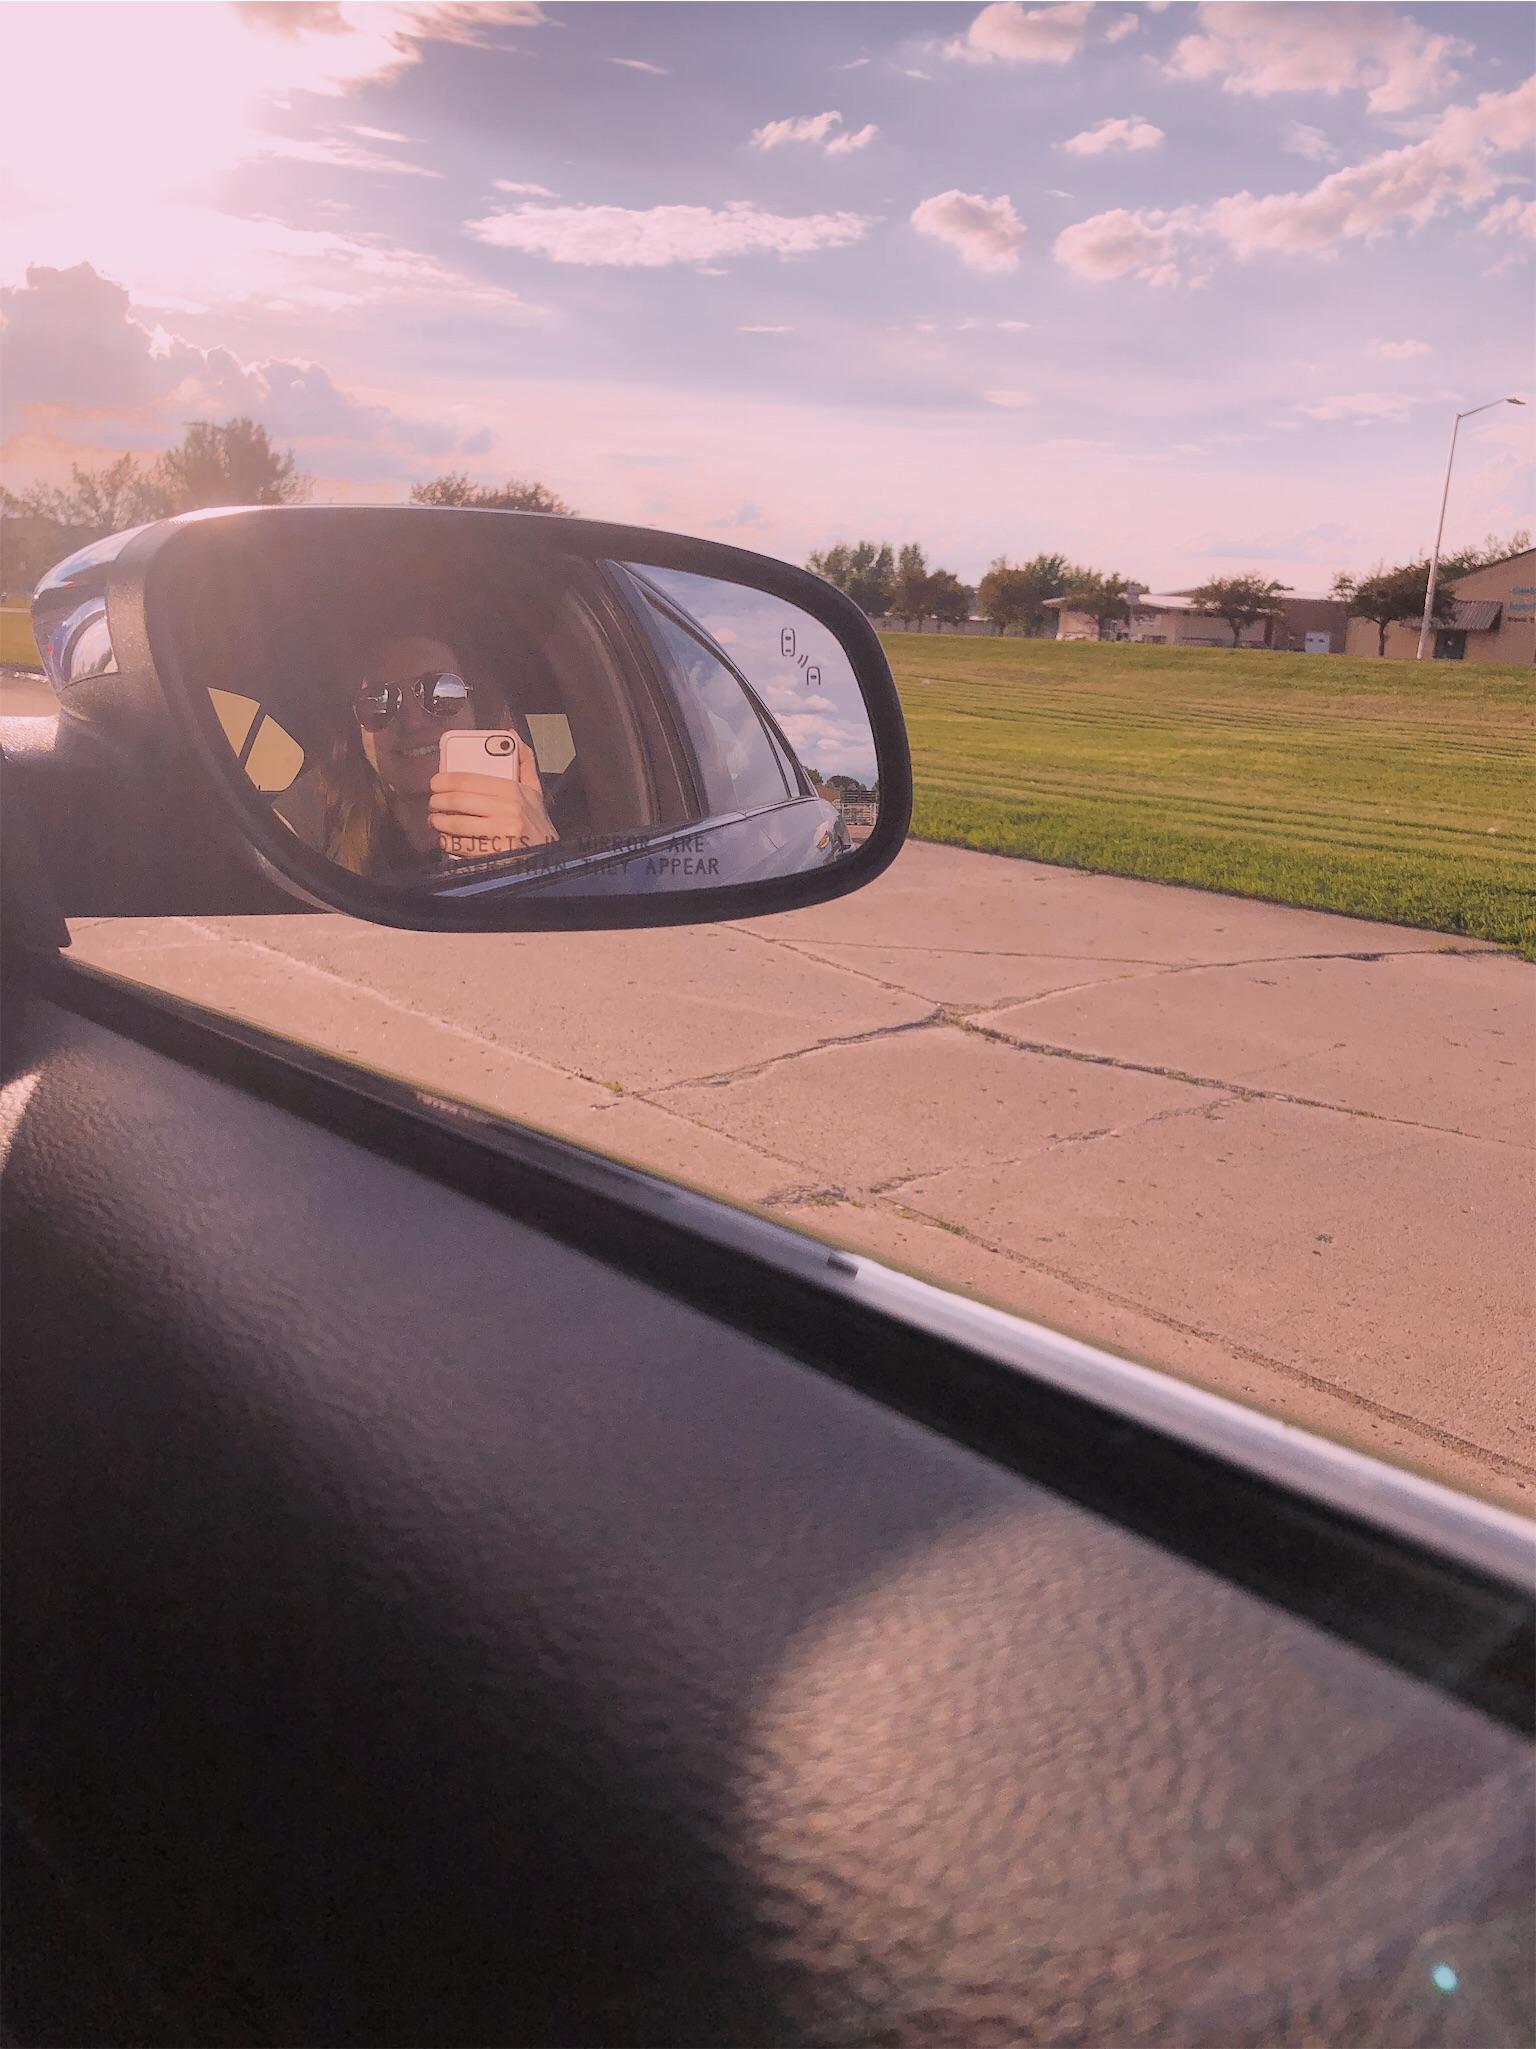 ashlee-mirror.jpg